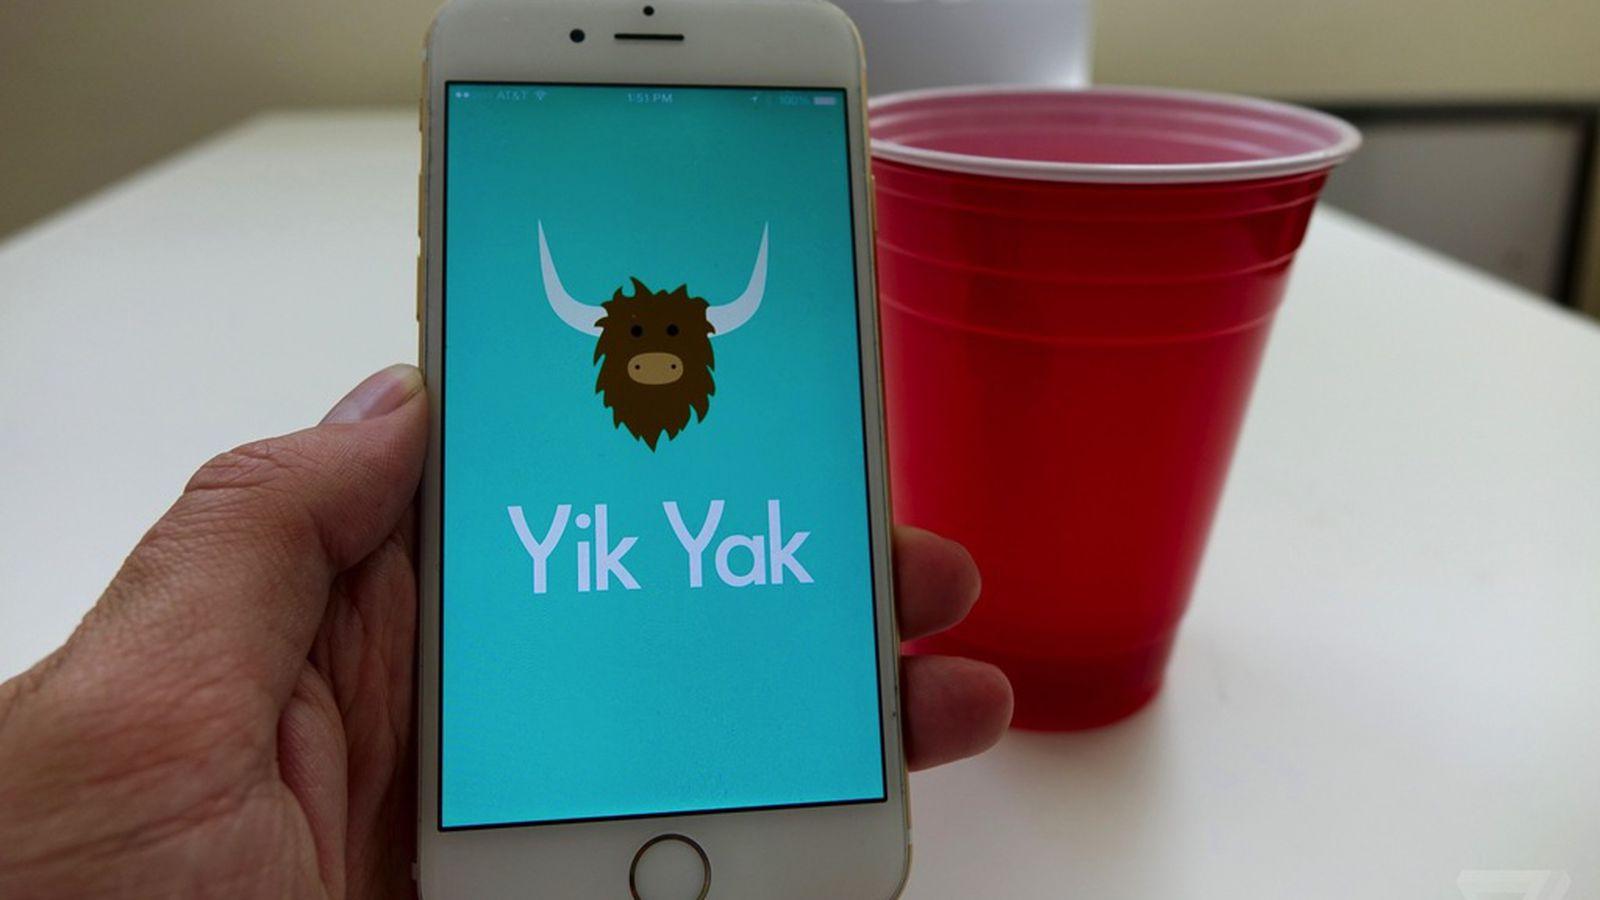 yik yaks growth flatlined - HD1310×873